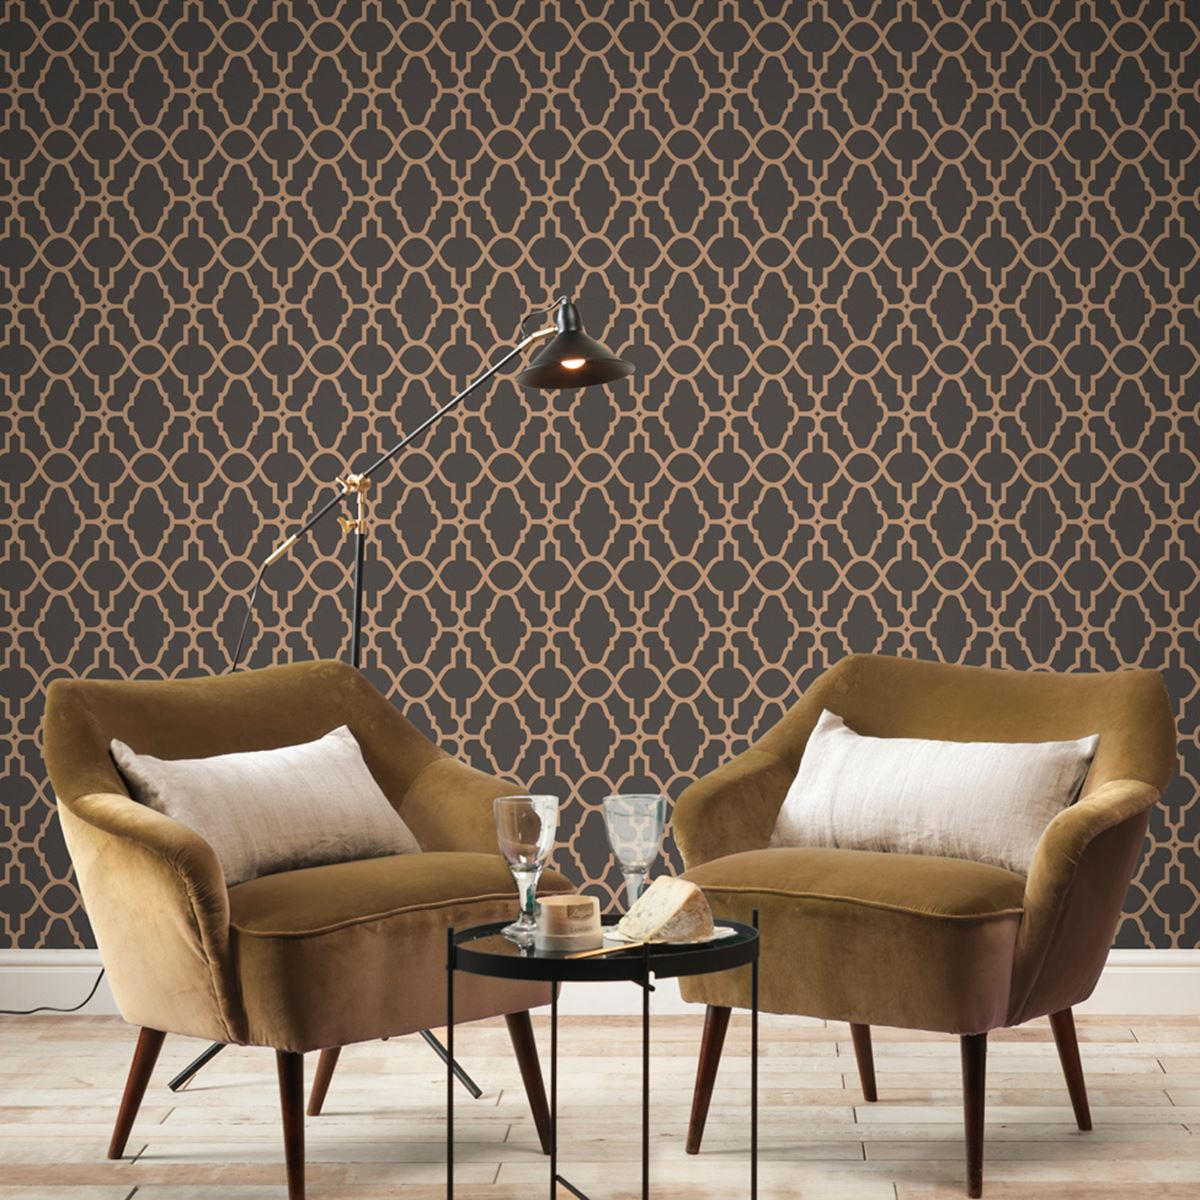 Apex Trellis Sidewall Wallpaper Copper: GEOMETRIC WALLPAPER MODERN DECOR TRIANGLES TRELLIS SILVER ROSE GOLD METALLIC